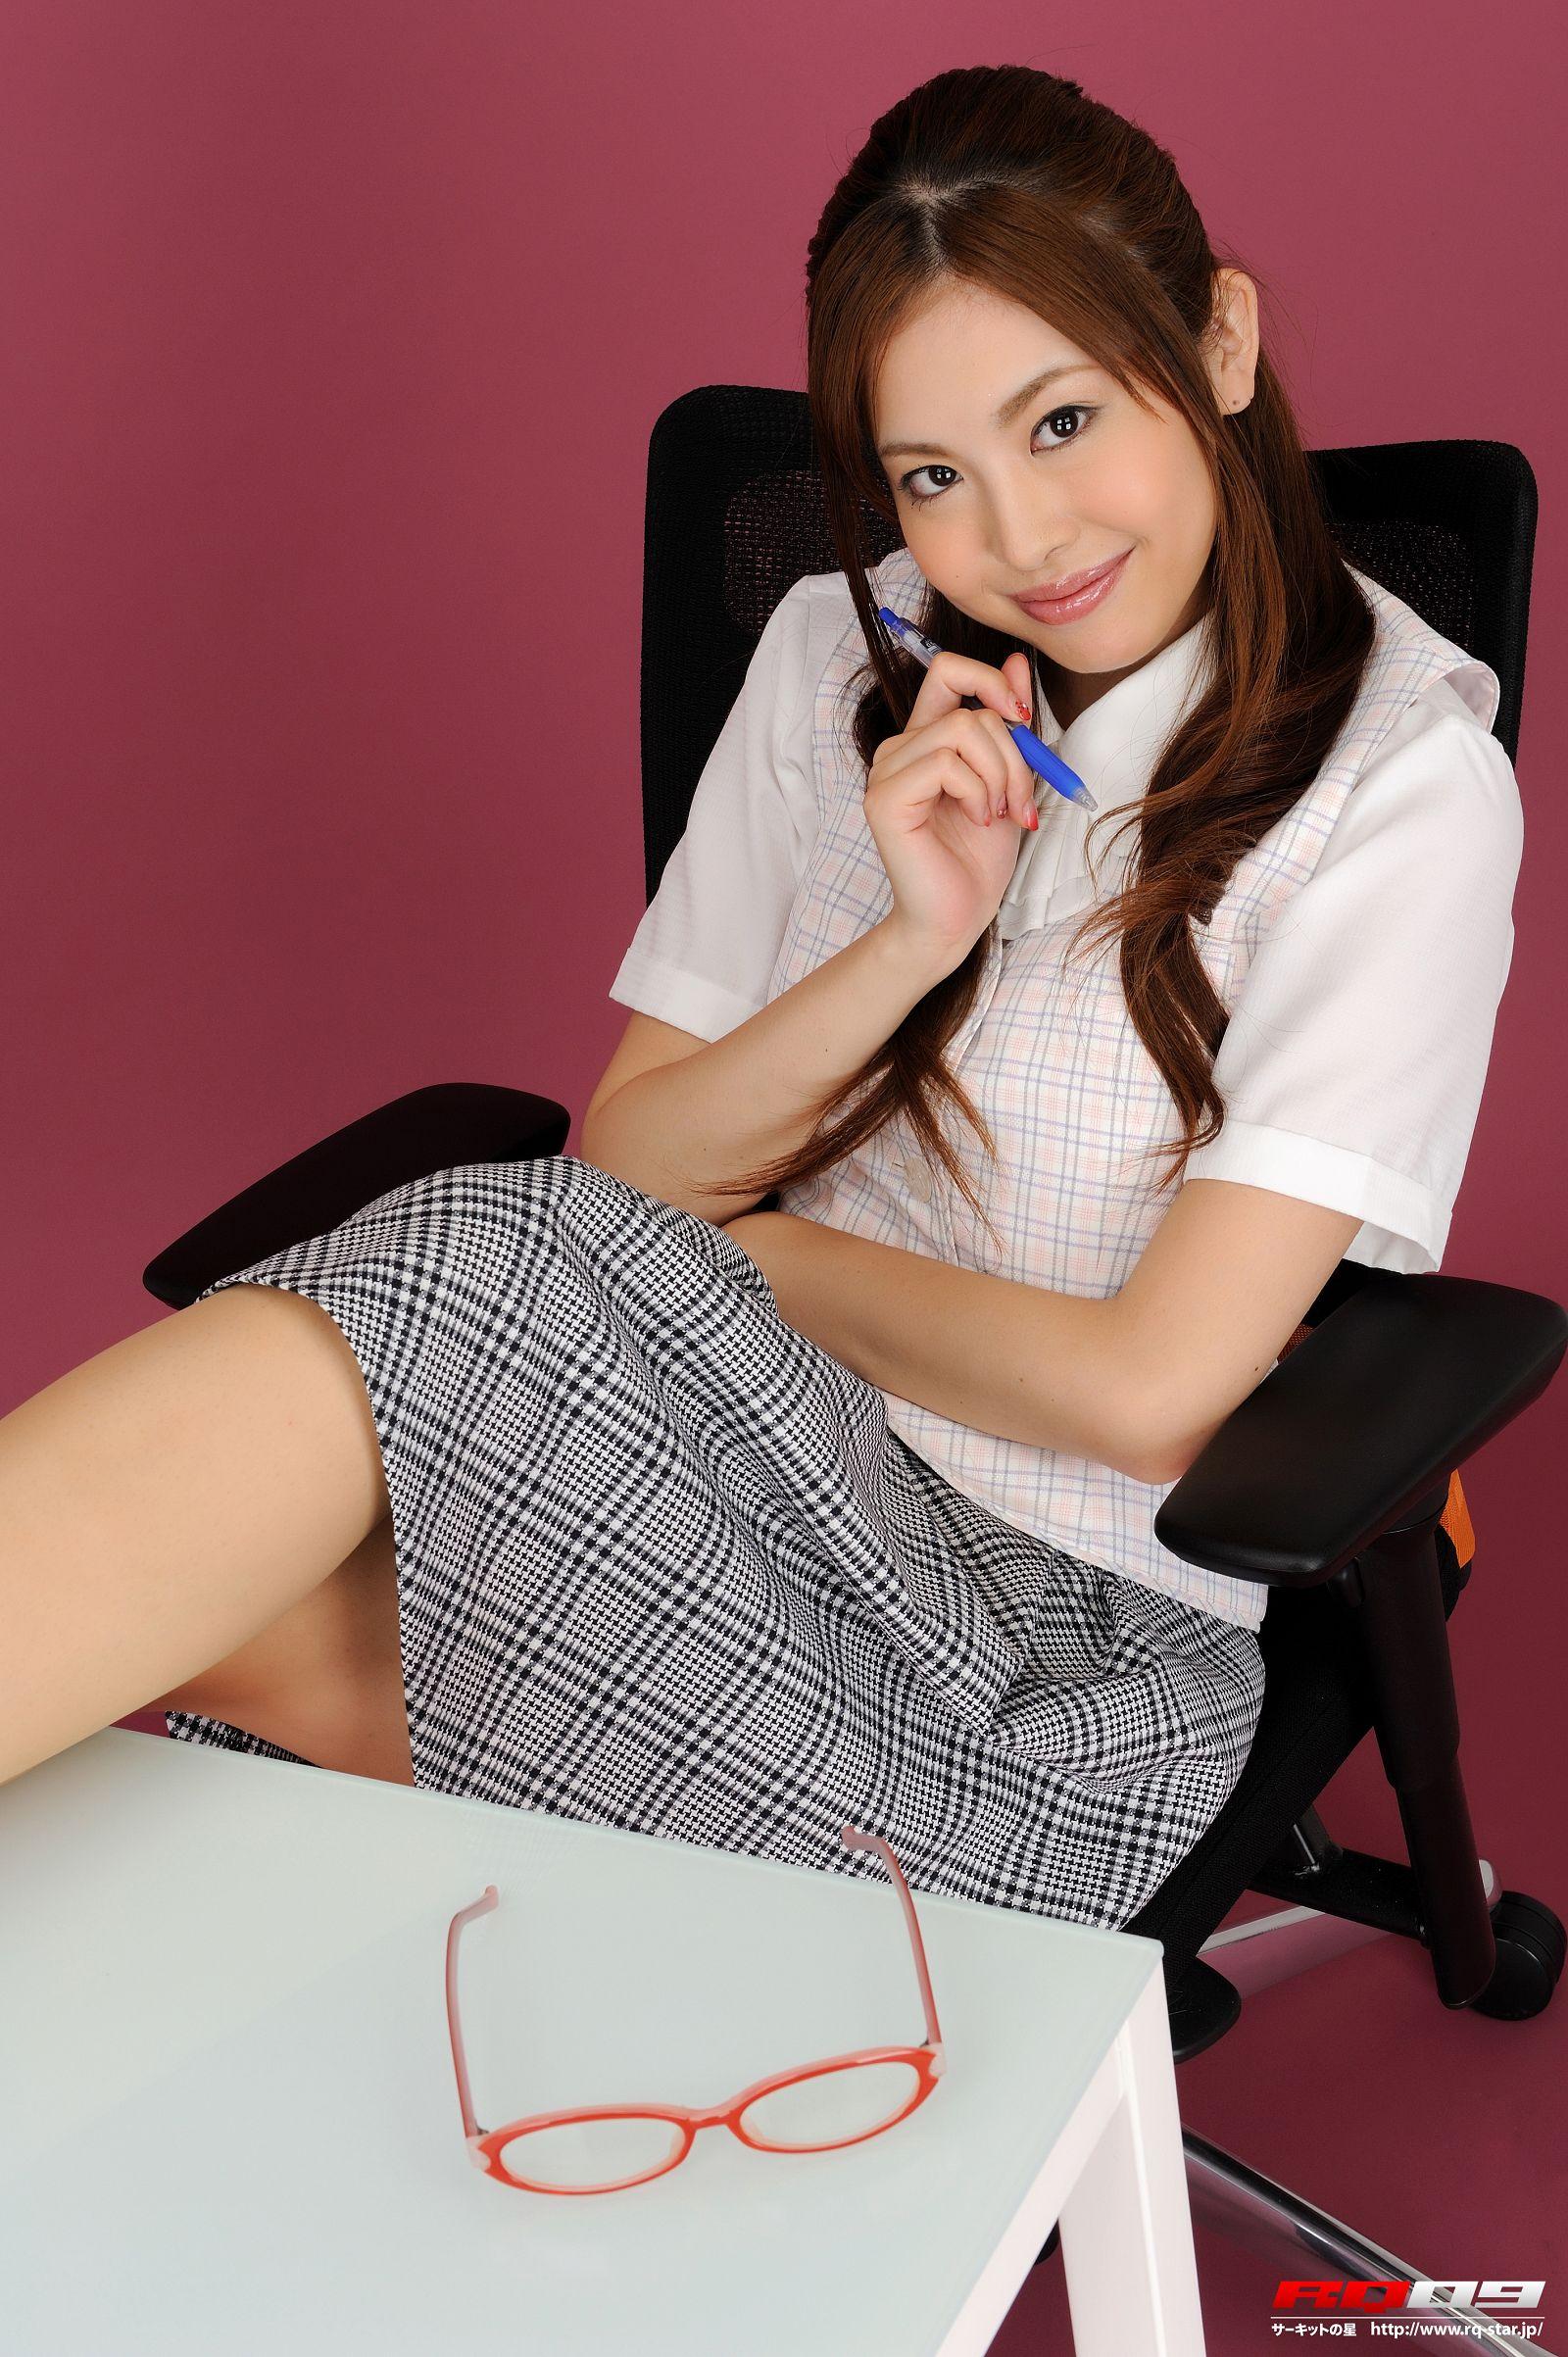 [RQ STAR美女] NO.0160 Sayuri Kouda 幸田さゆり Office Lady[130P] RQ STAR 第4张